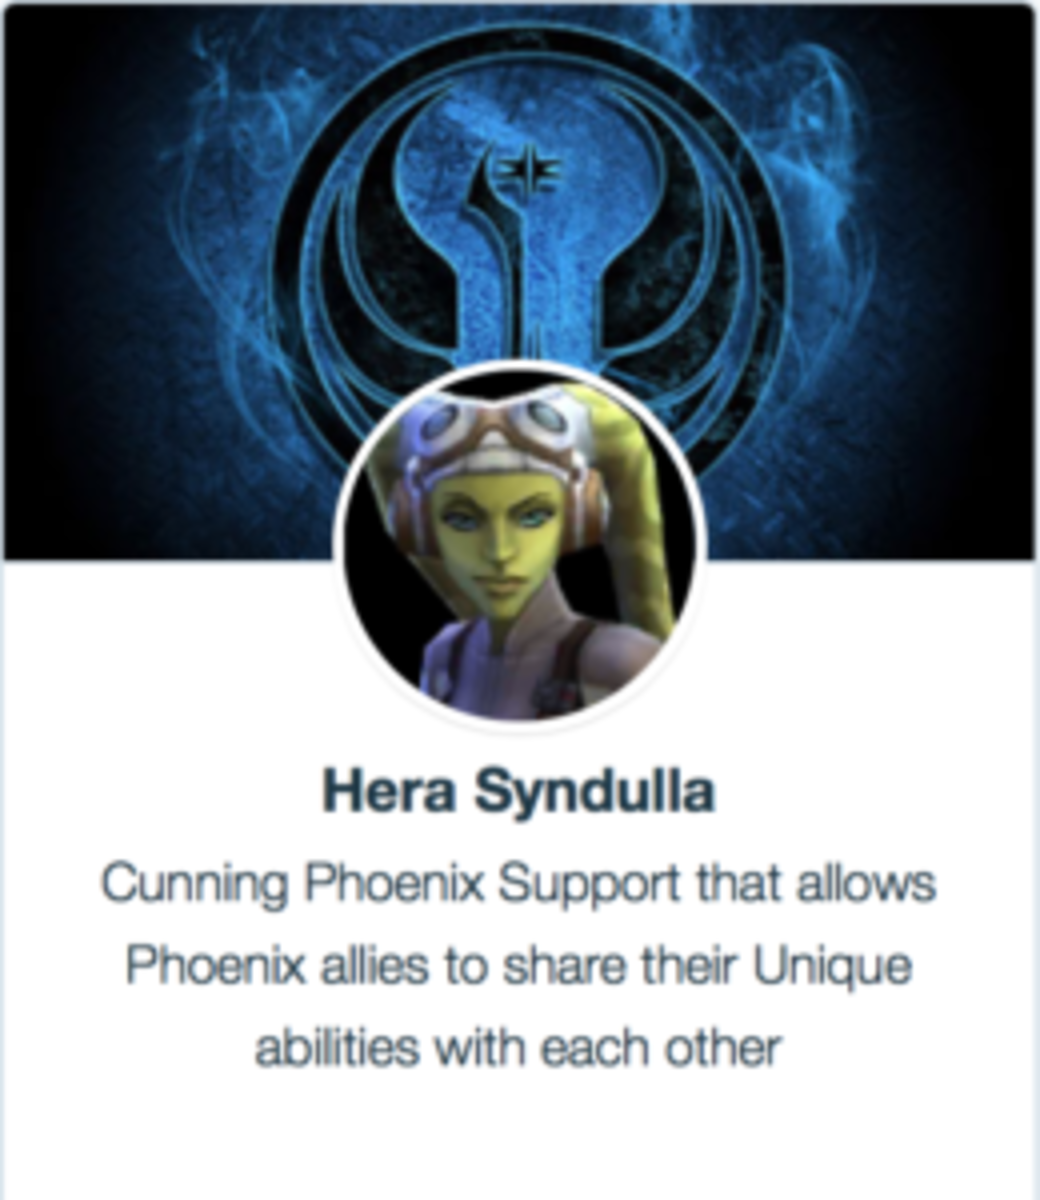 Hera, the Phoenix leader